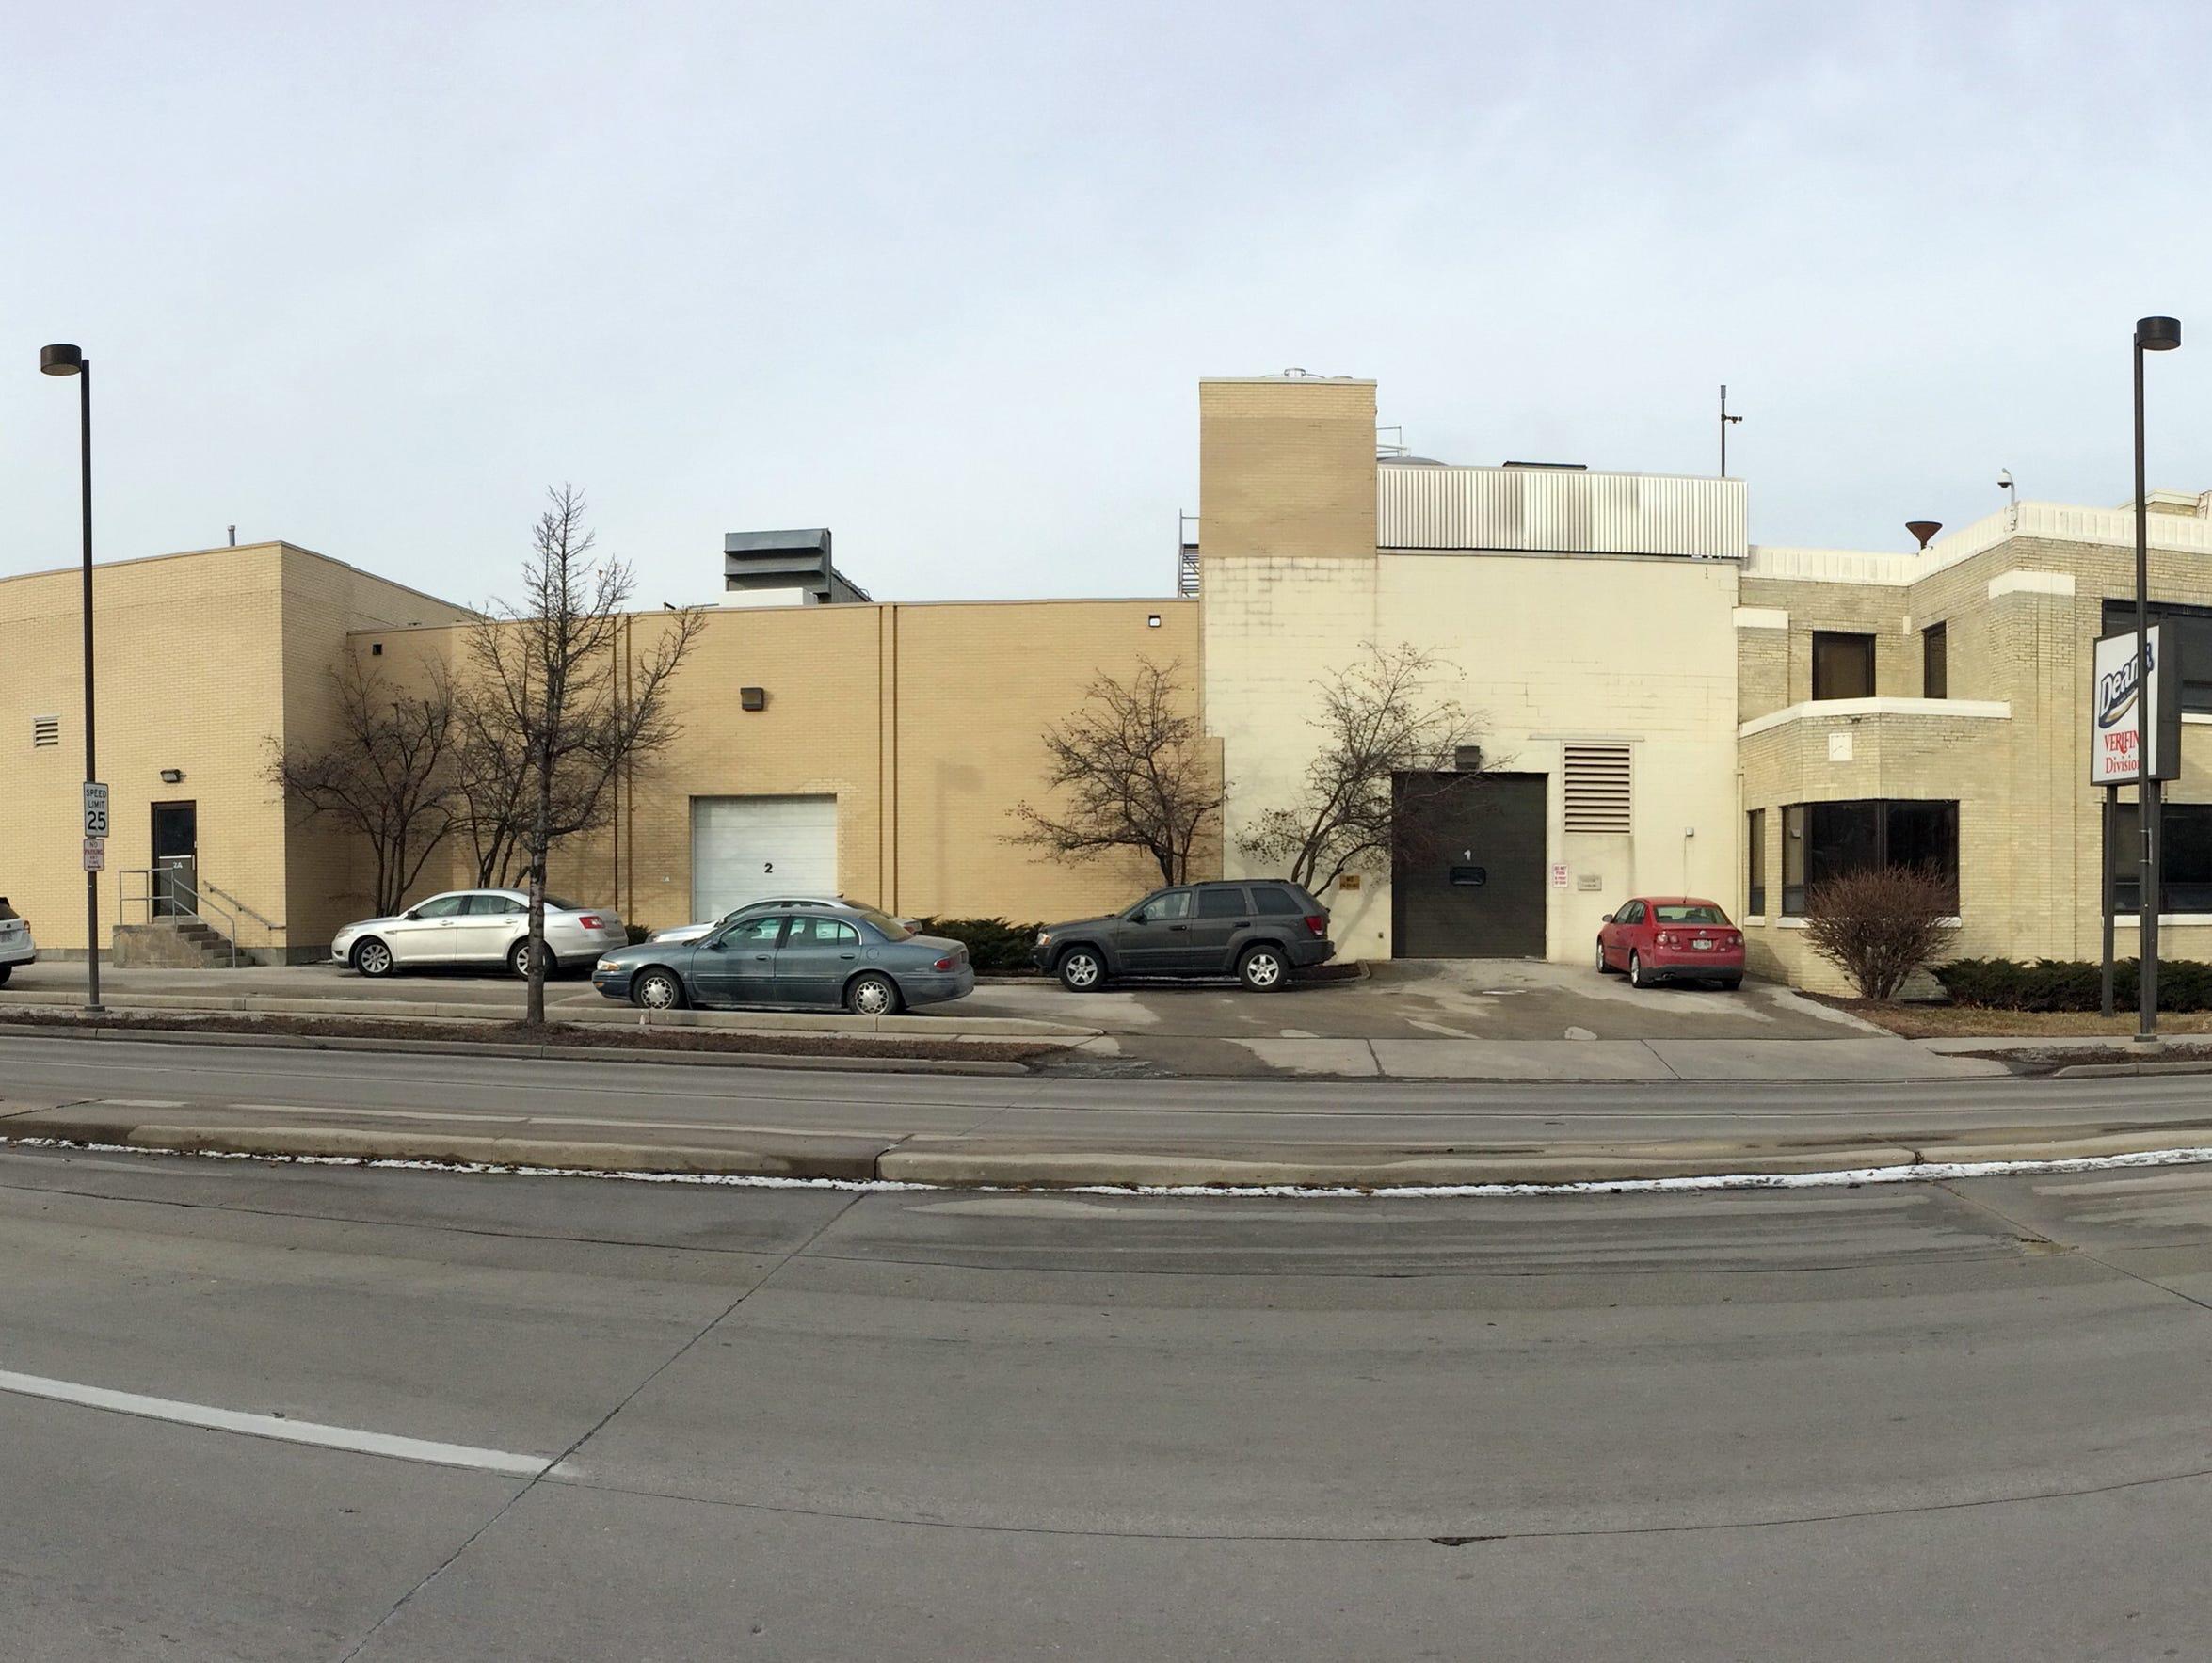 The Verifine Dairy Fluid Milk plant at 1606 Erie Ave.